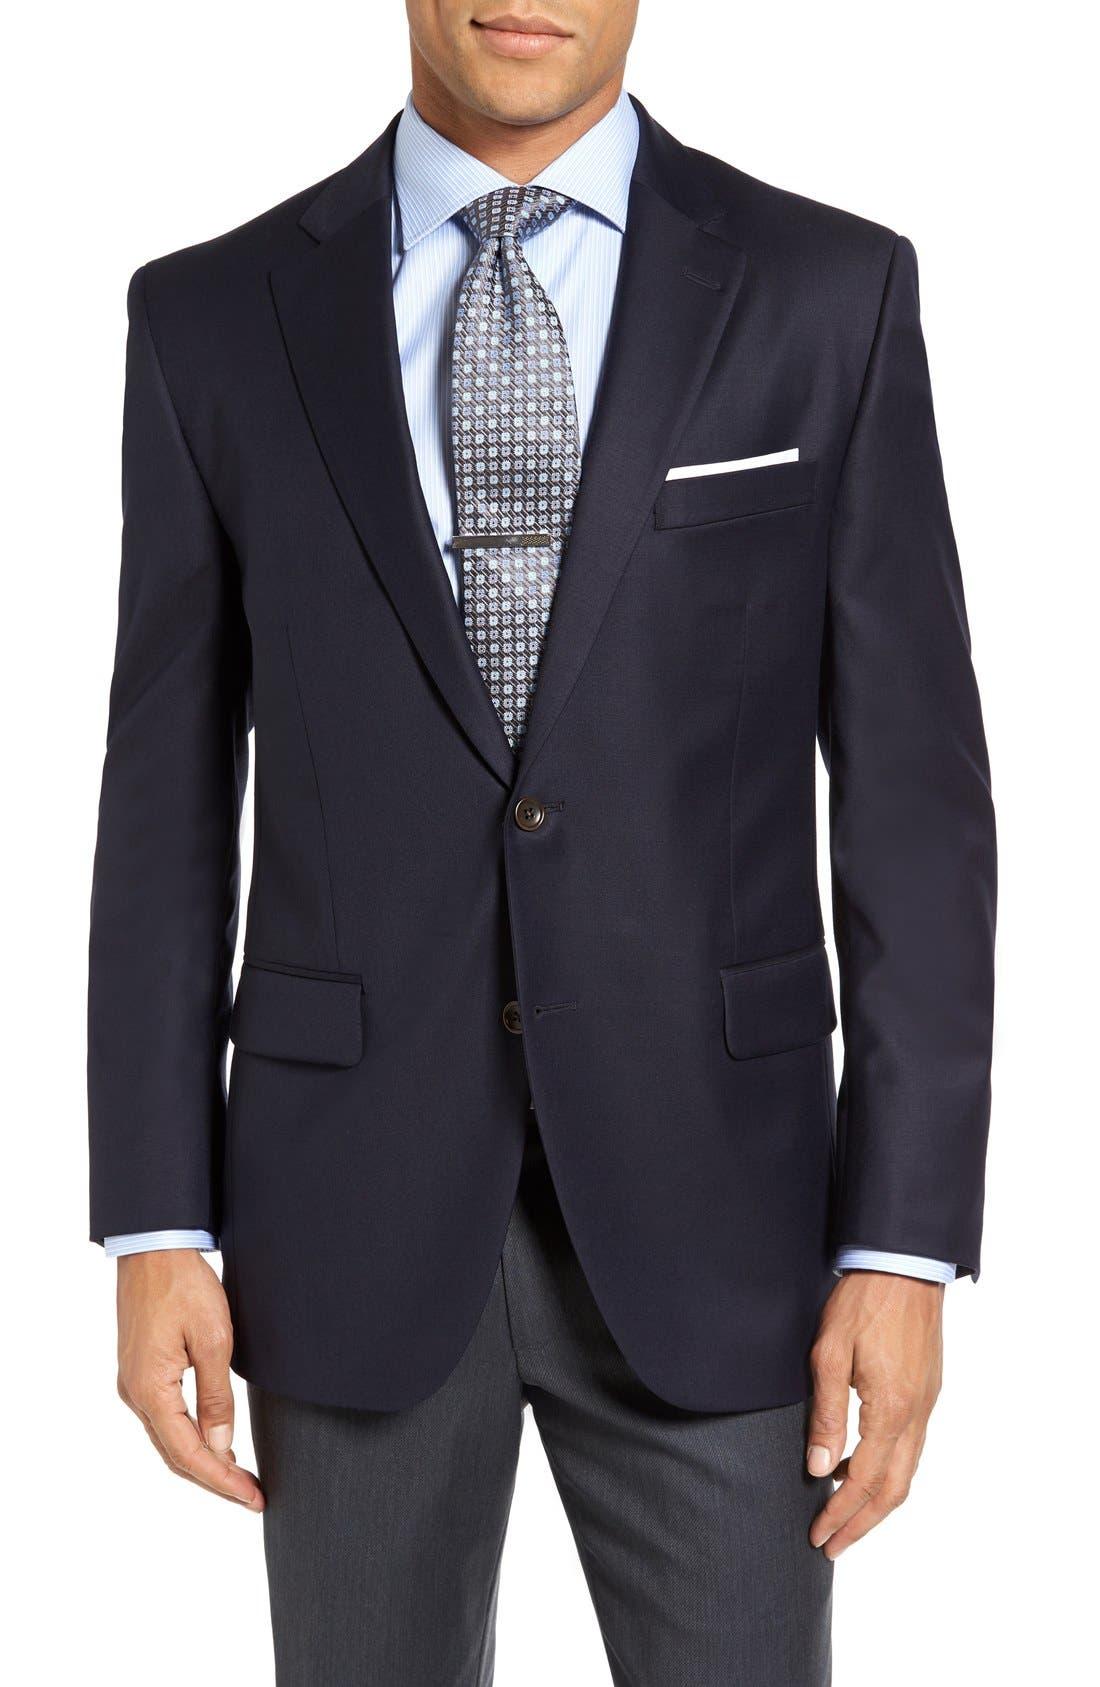 Alternate Image 1 Selected - Peter Millar 'Flynn' Classic Fit Navy Wool Blazer